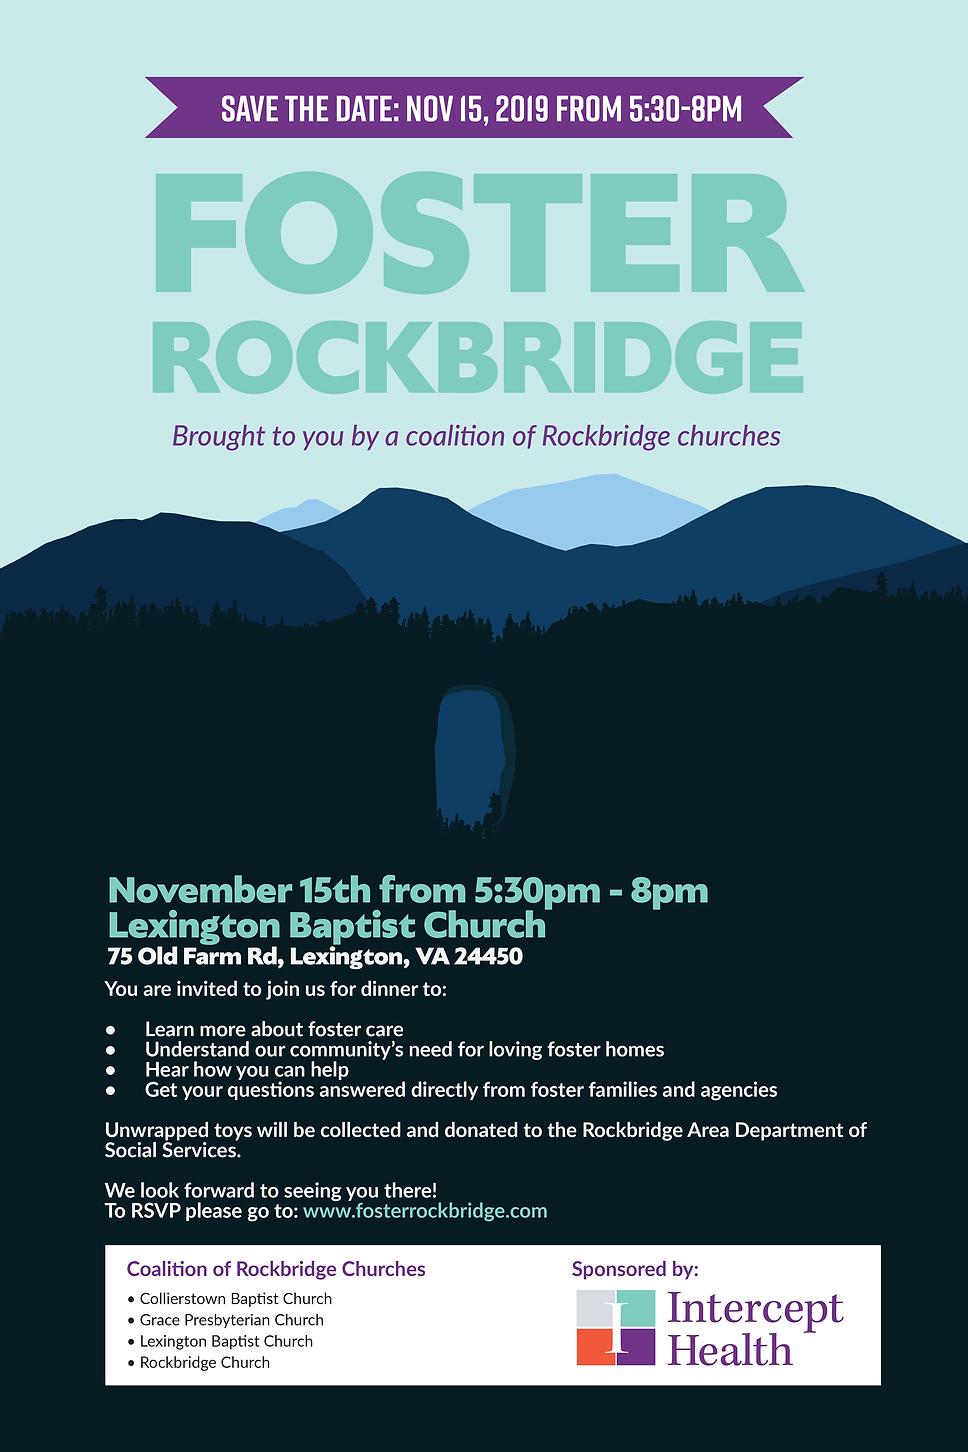 Foster_Rockbridge_Poster_Final.png